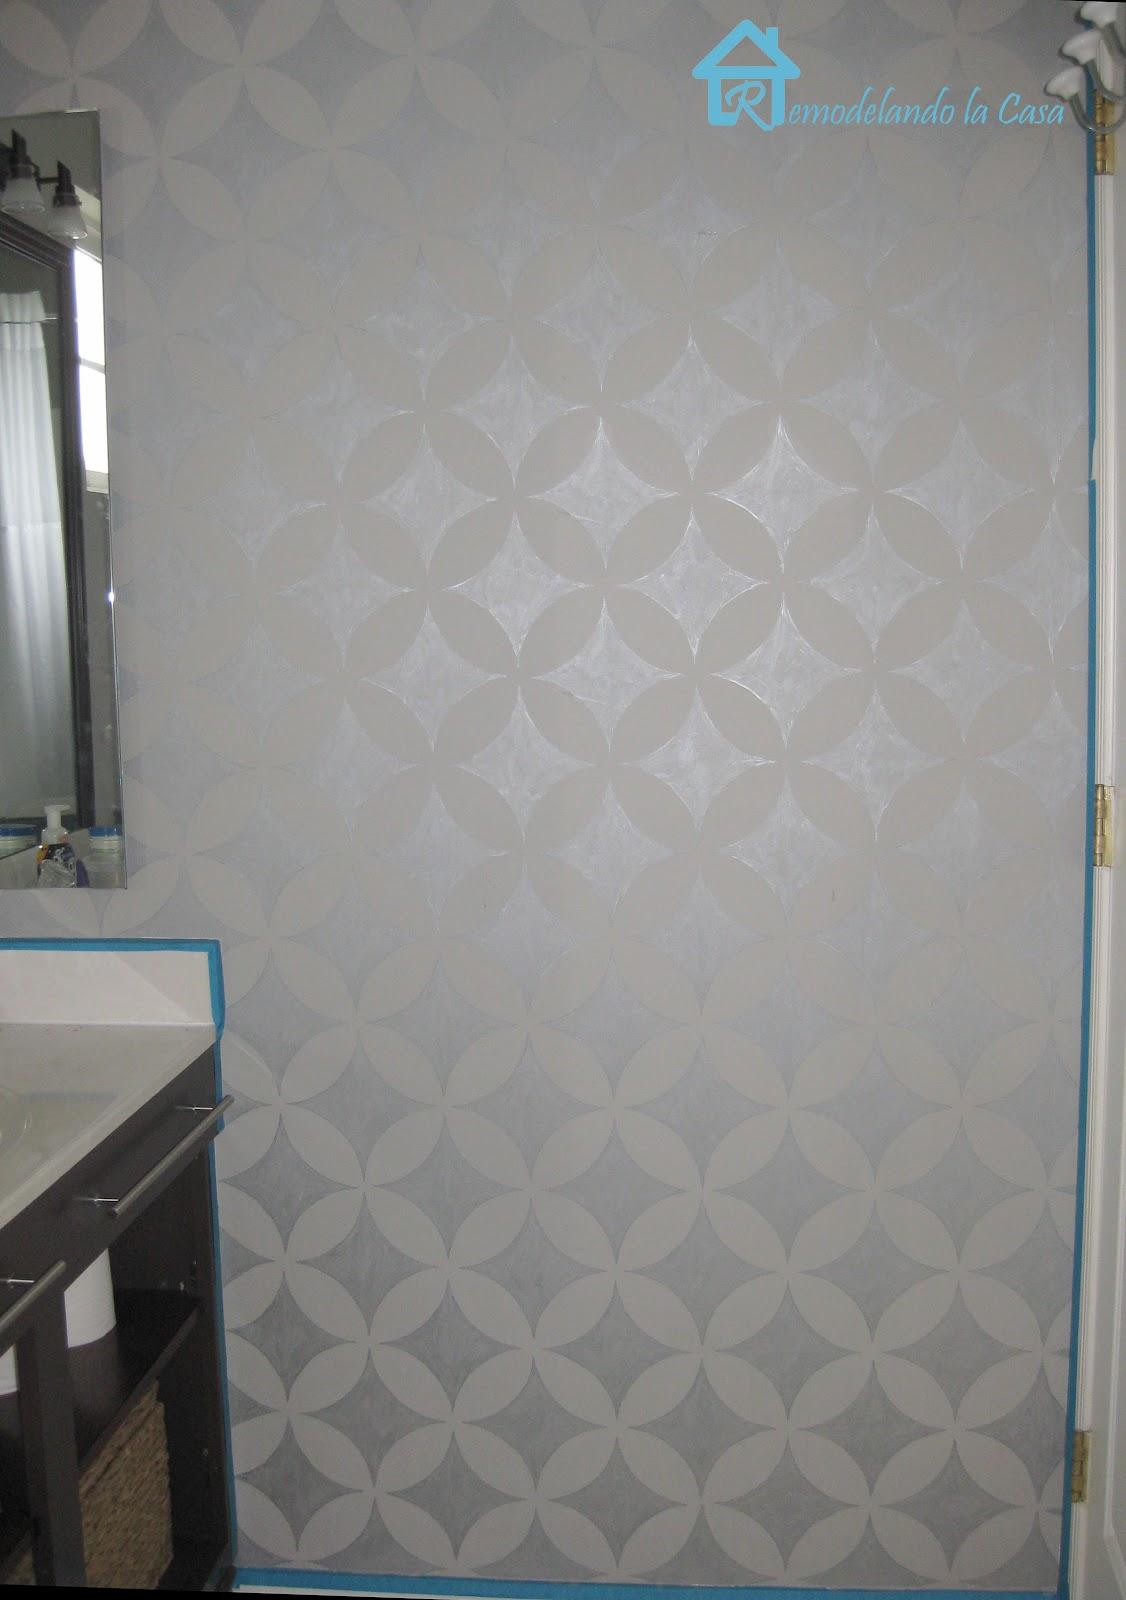 Remodelando la Casa Painted Geometric Wall